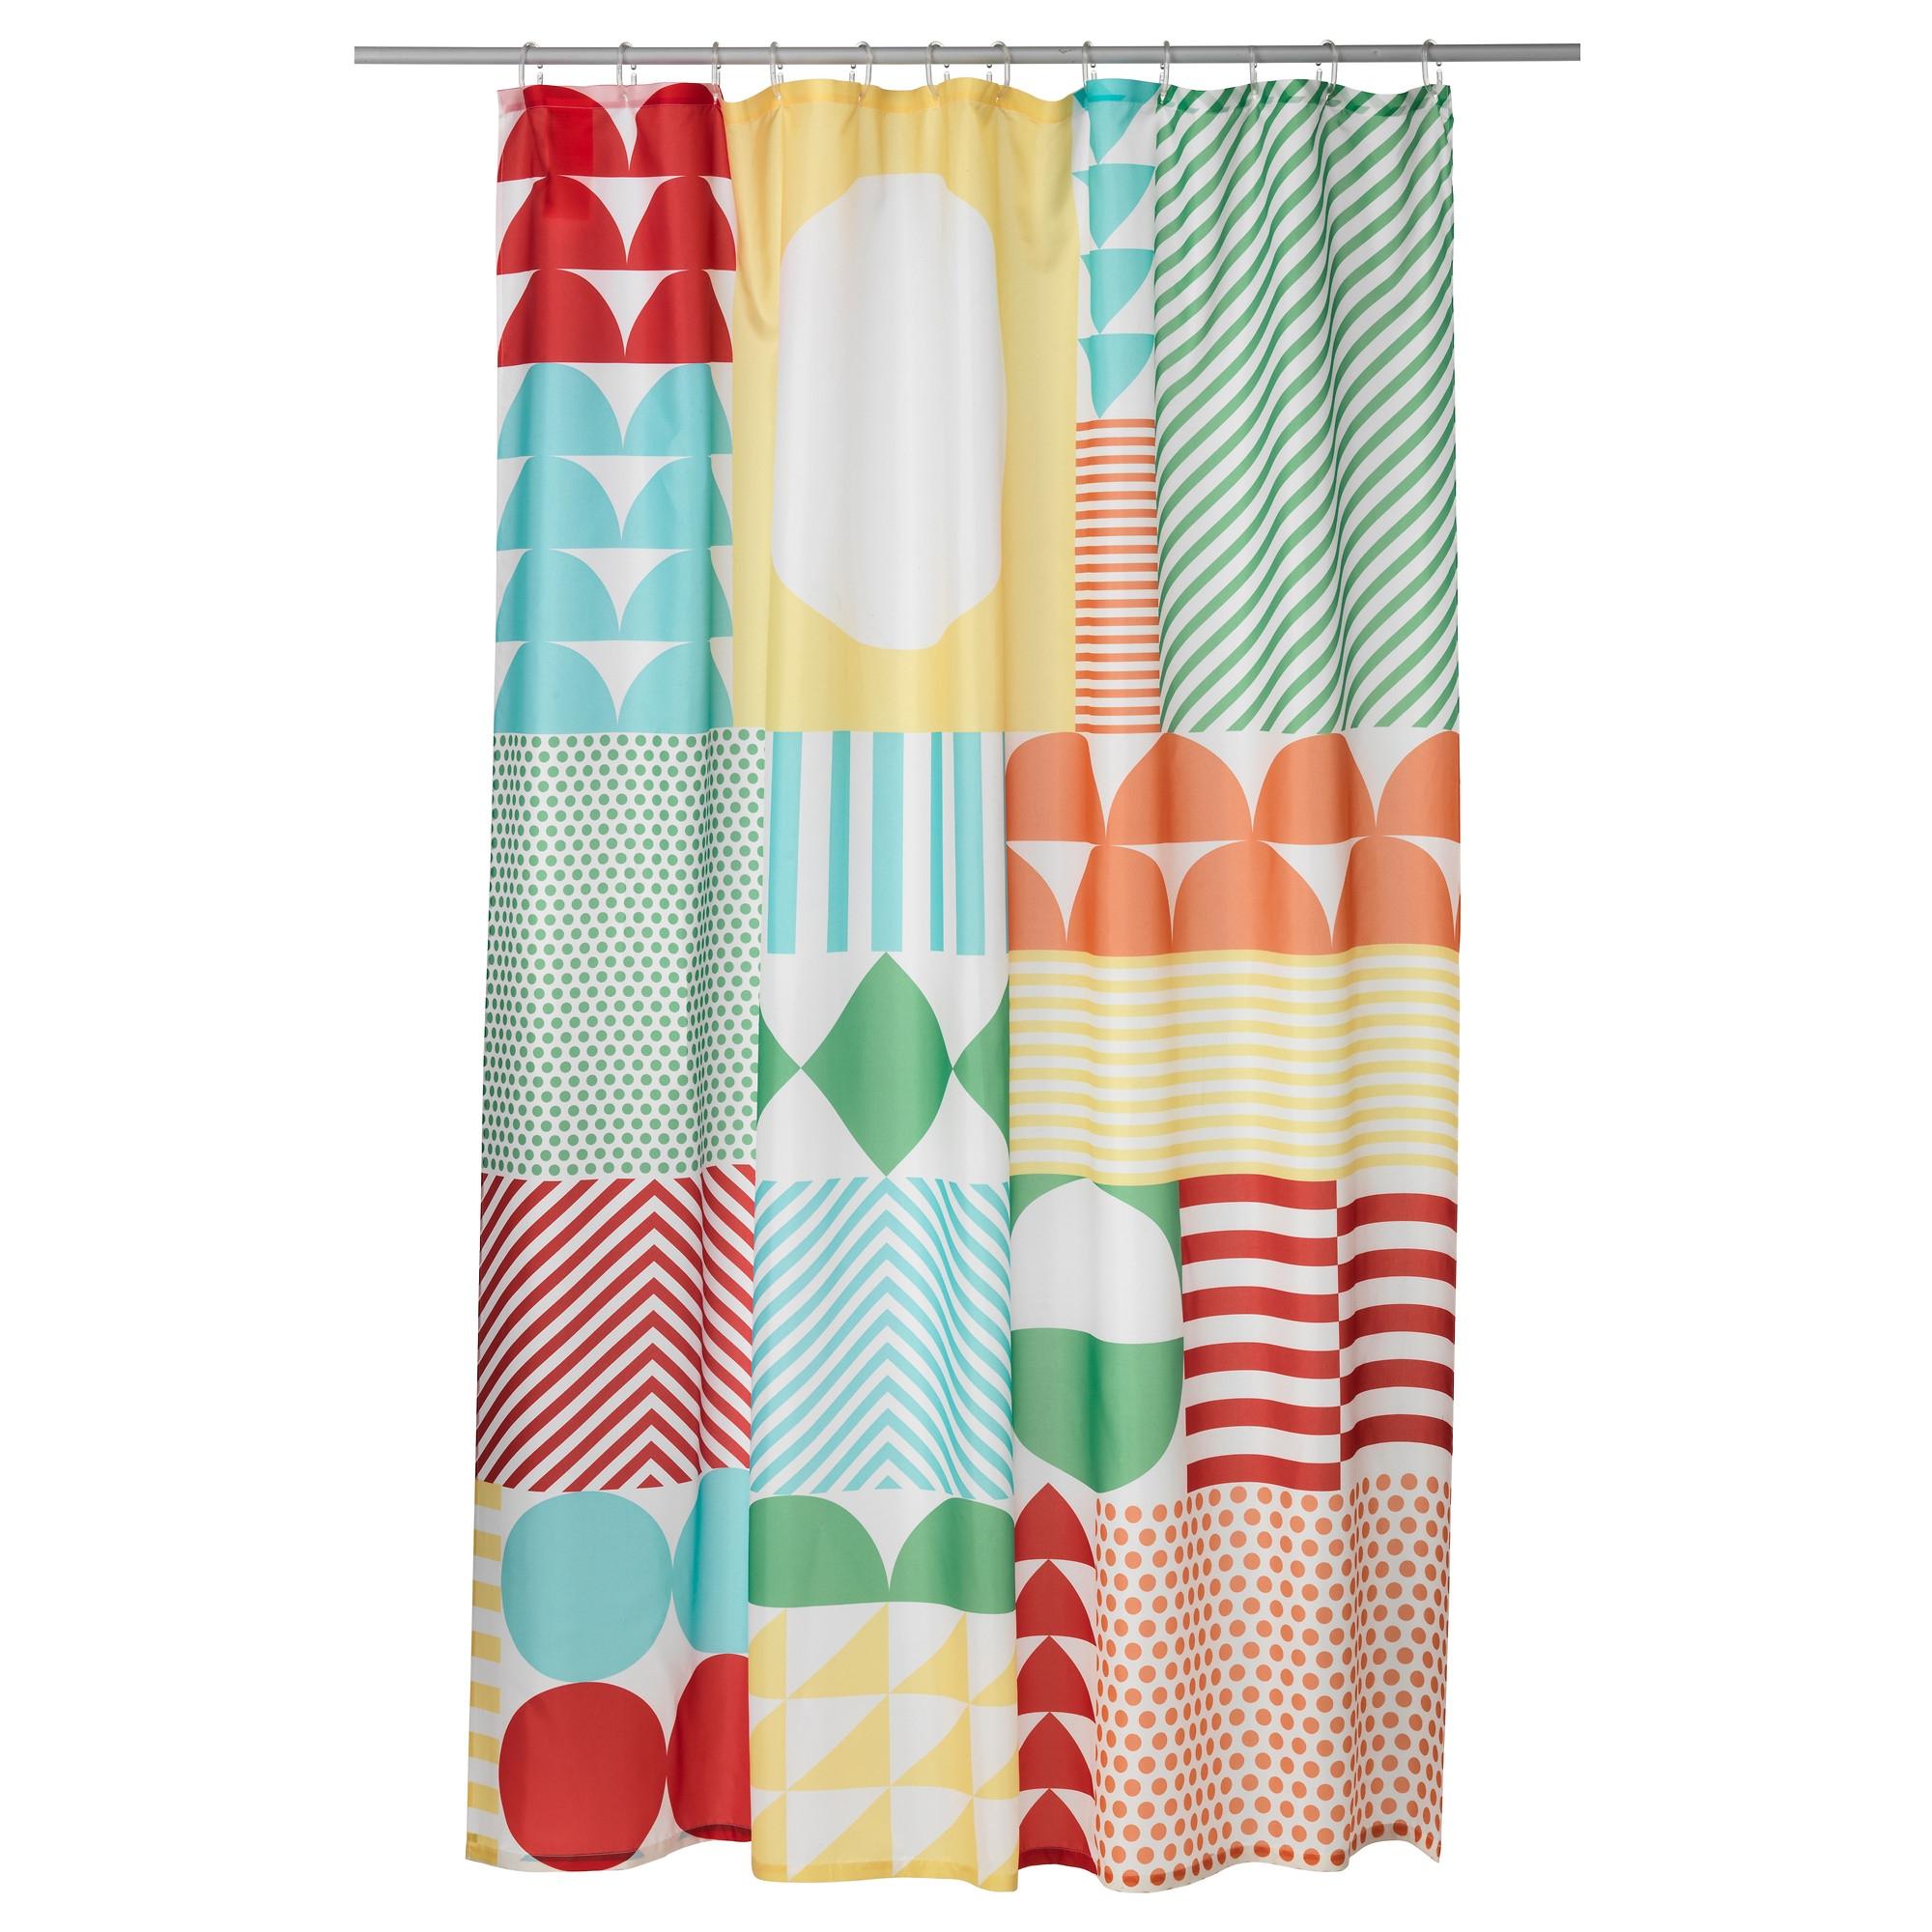 Nimmern cortina de ducha - Cortinas de ducha ikea ...